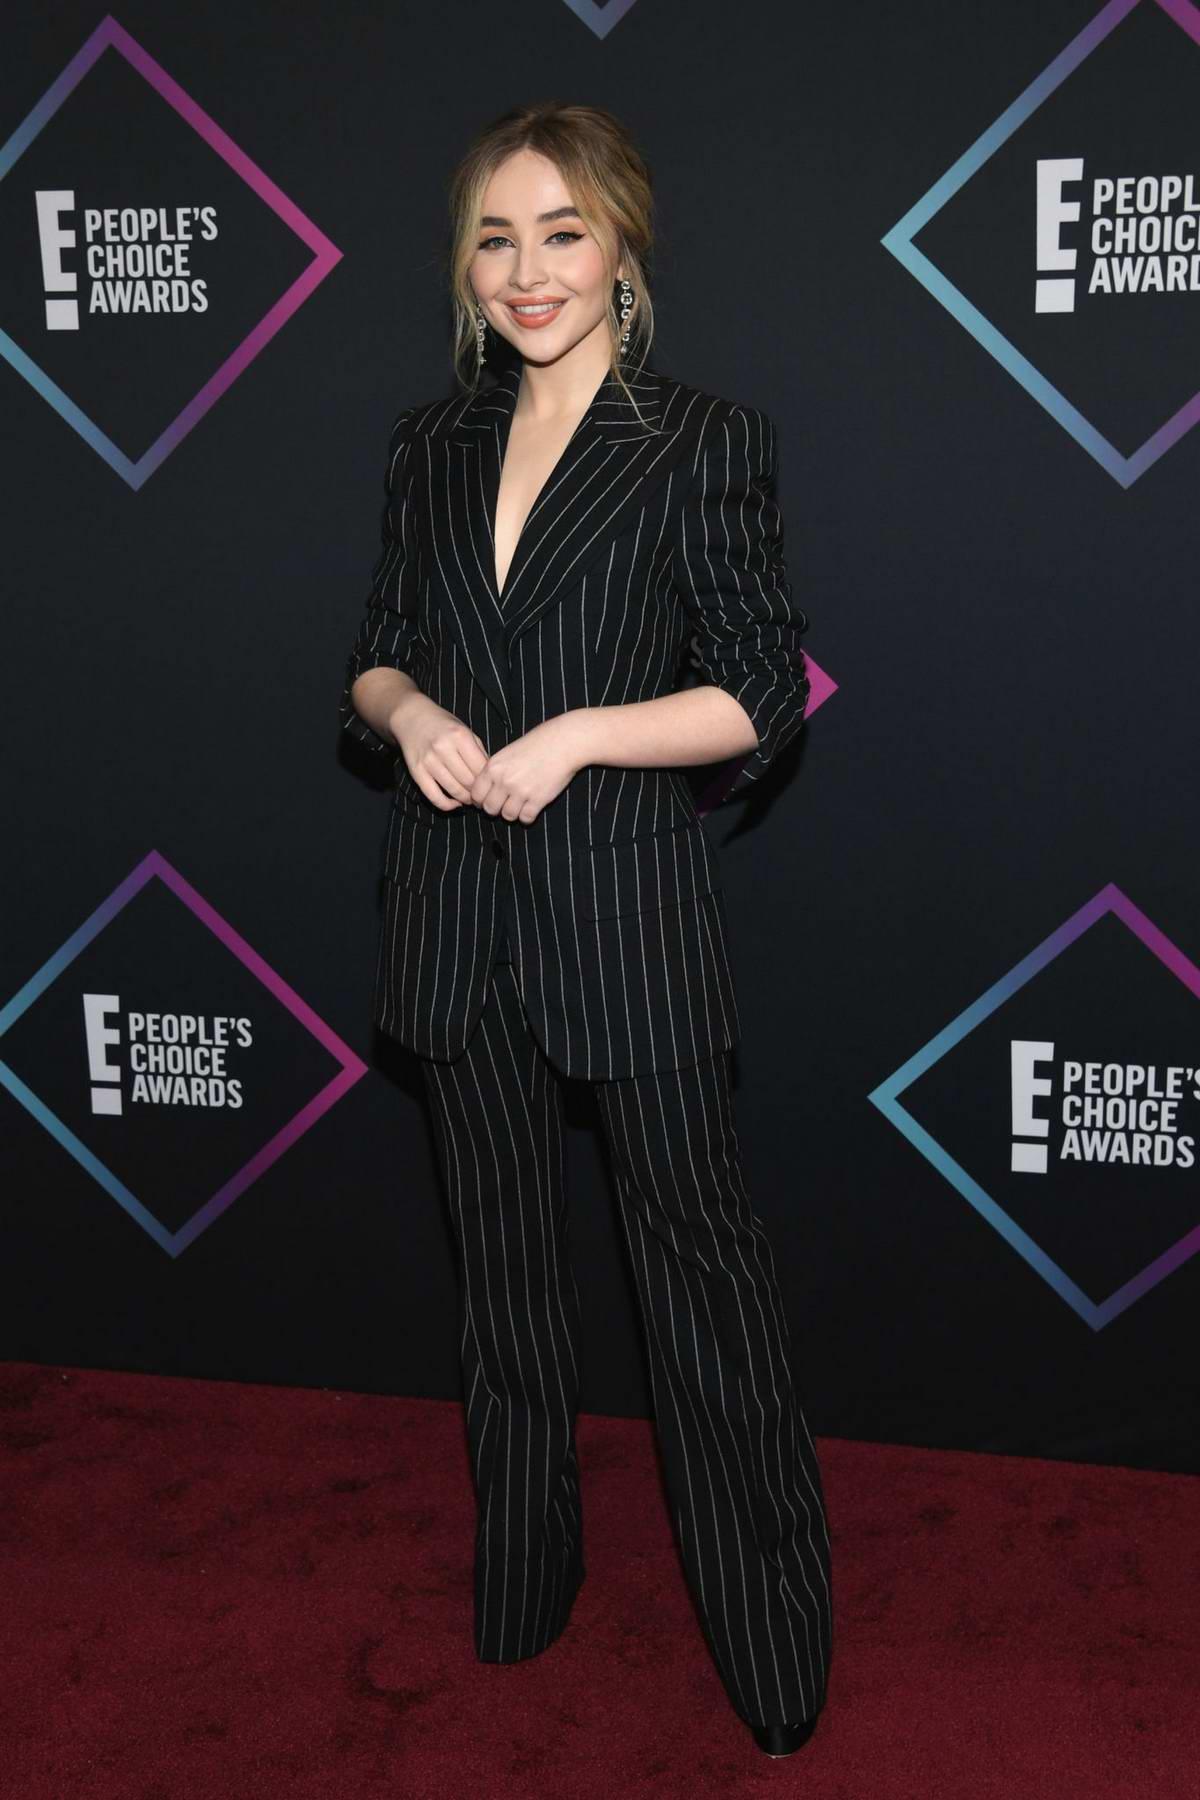 Sabrina Carpenter attends People's Choice Awards 2018 at Barker Hangar in Santa Monica, California